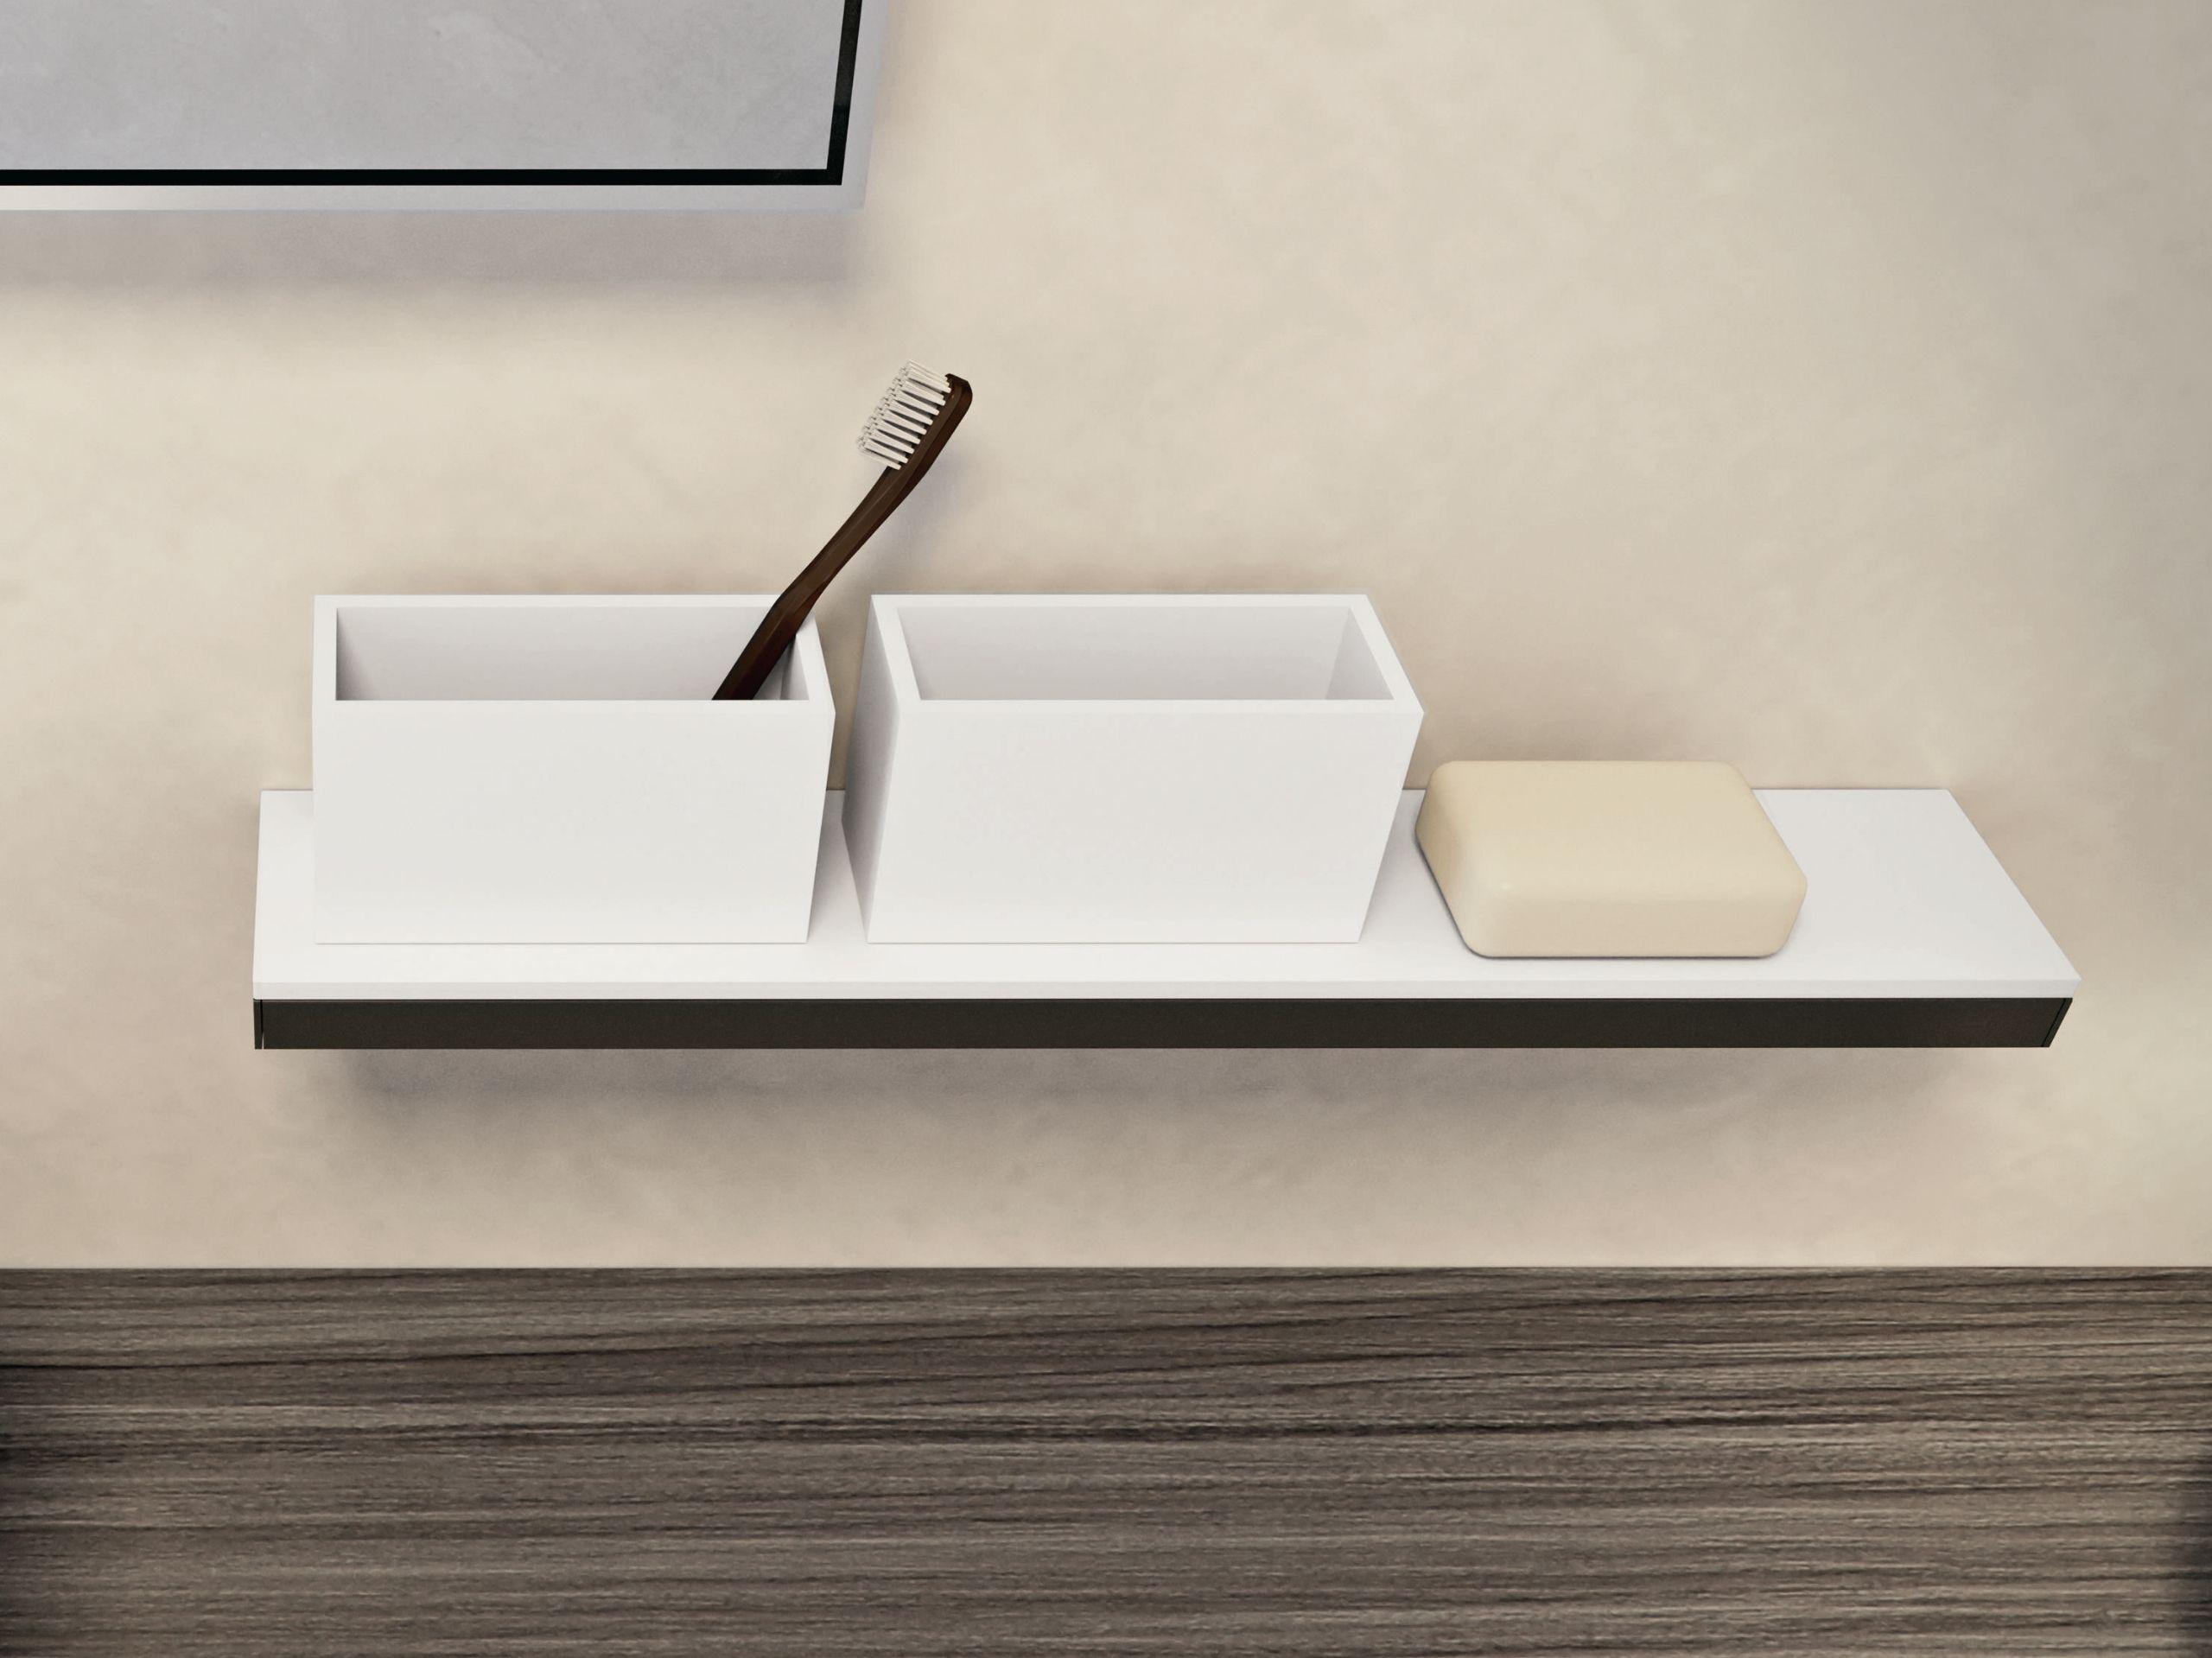 Bathroom wall shelf - Bathroom Wall Shelf 39